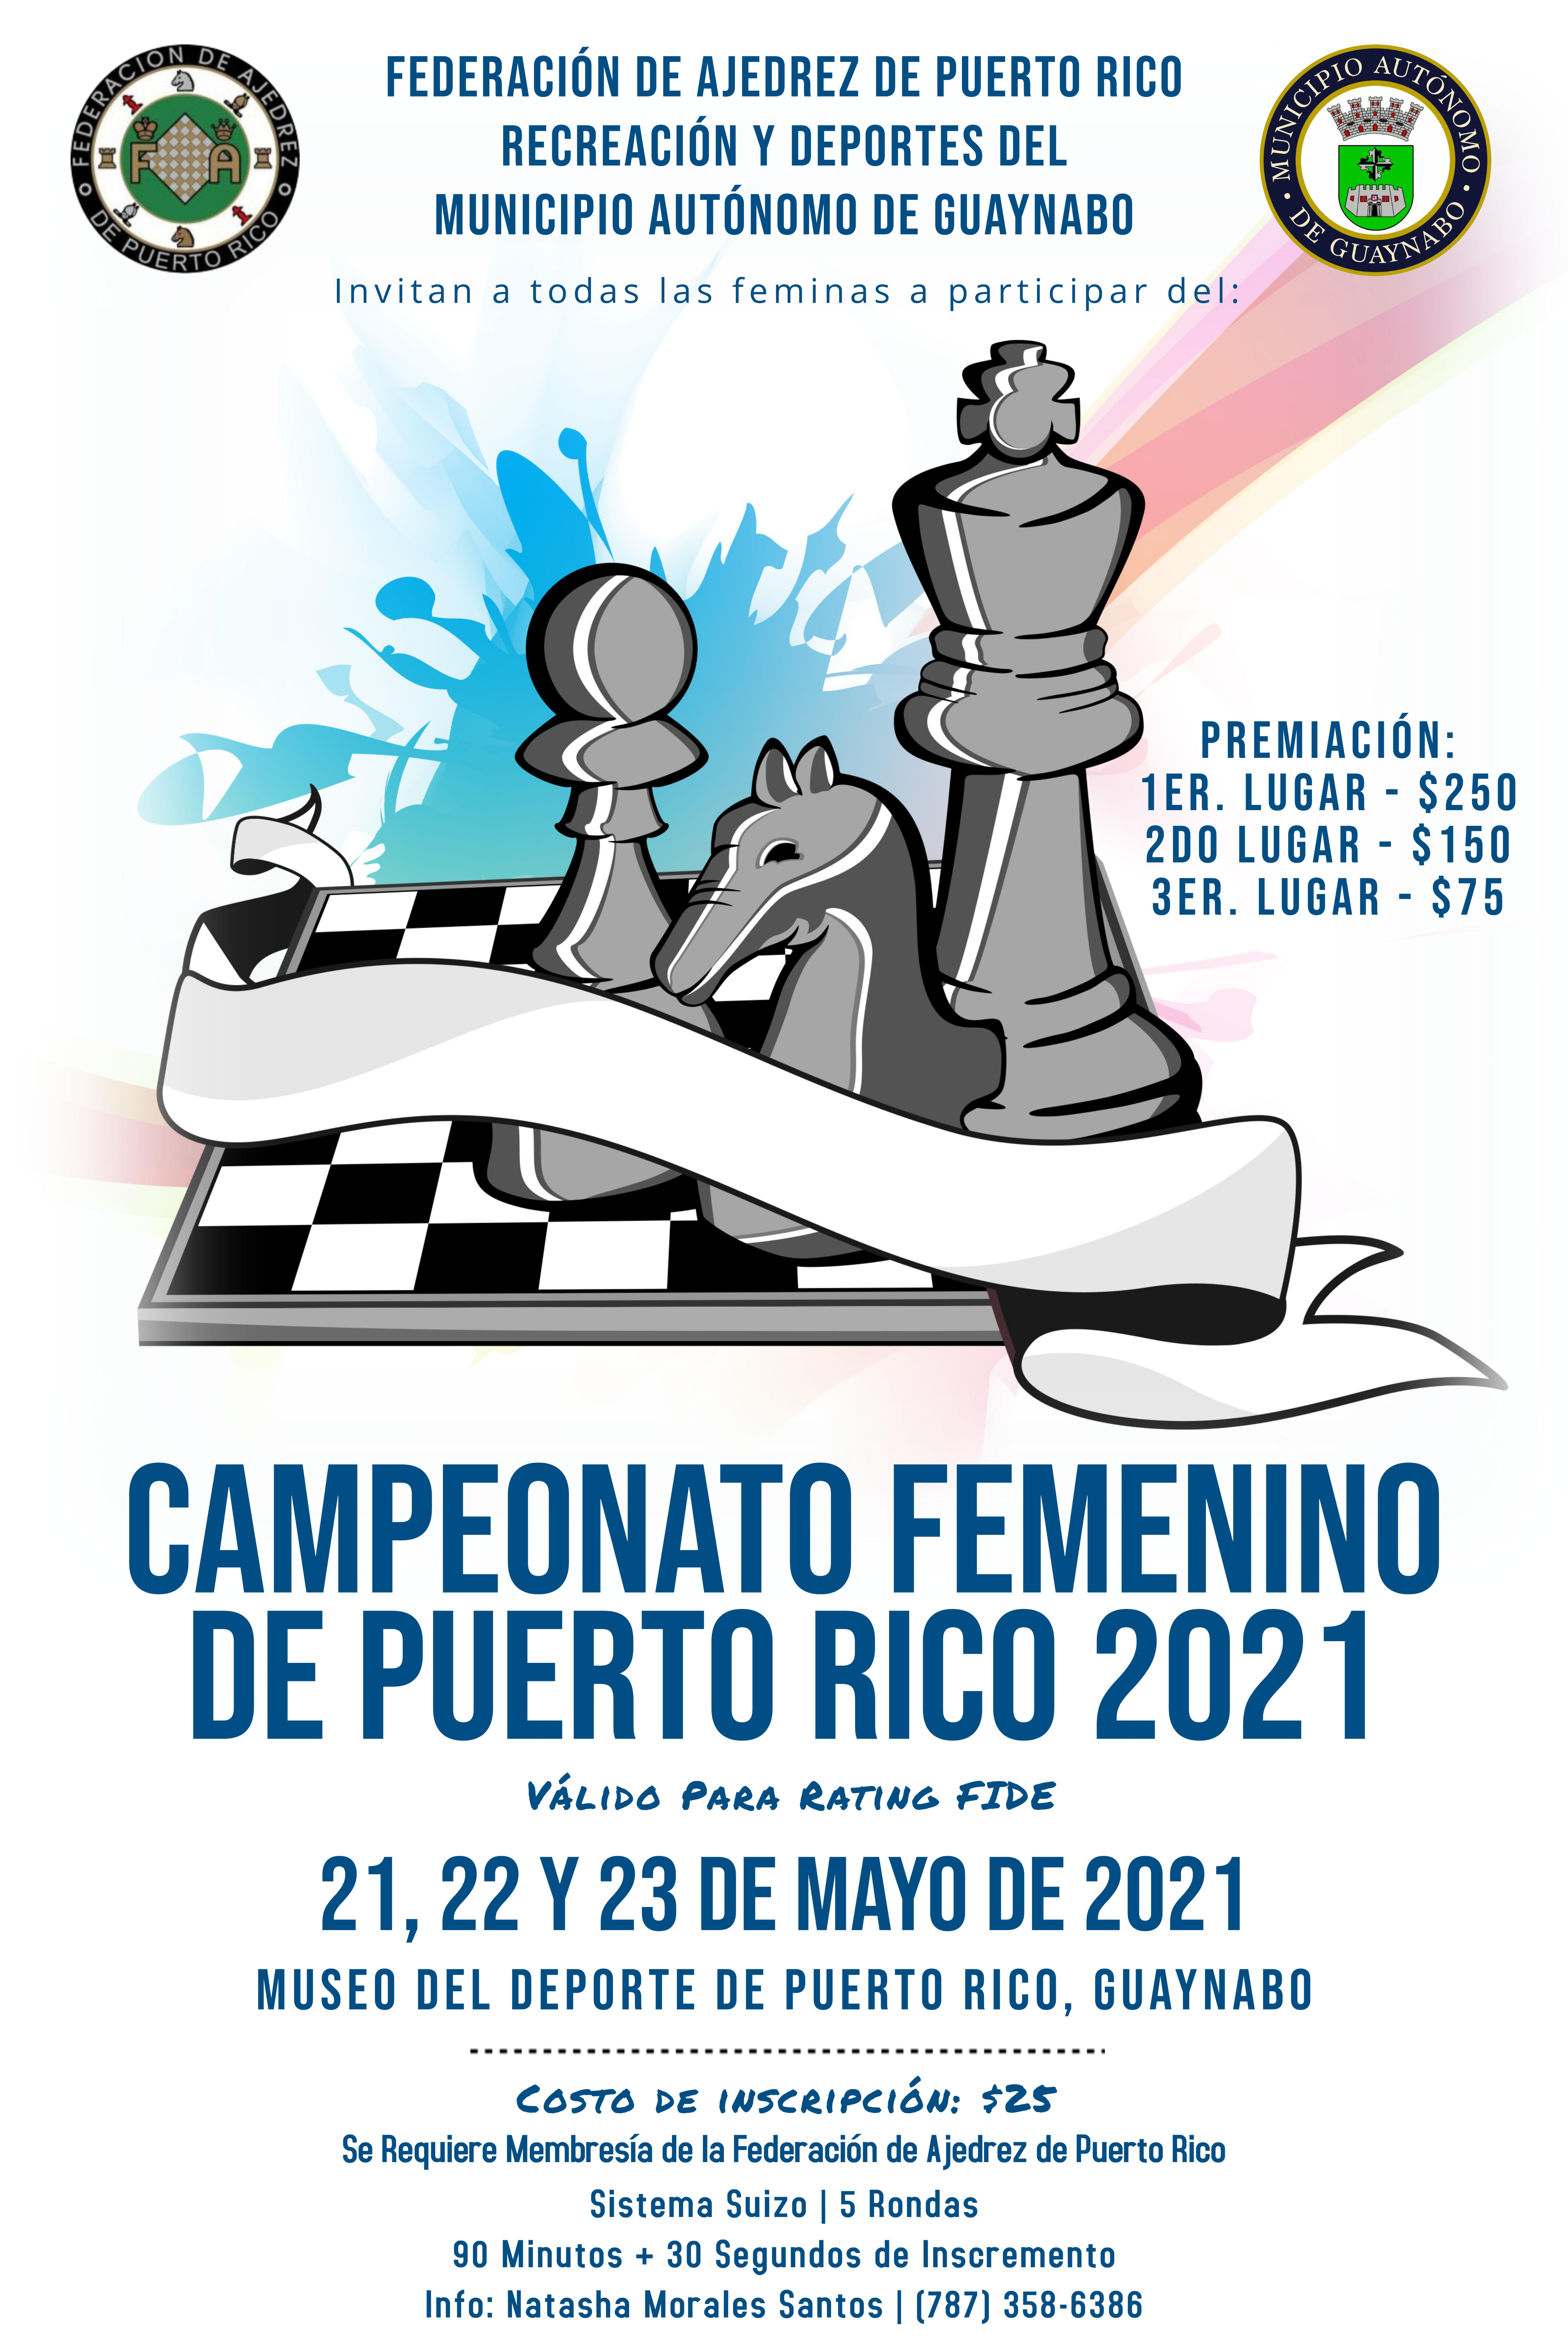 Campeonato Femenino de Puerto Rico 2021